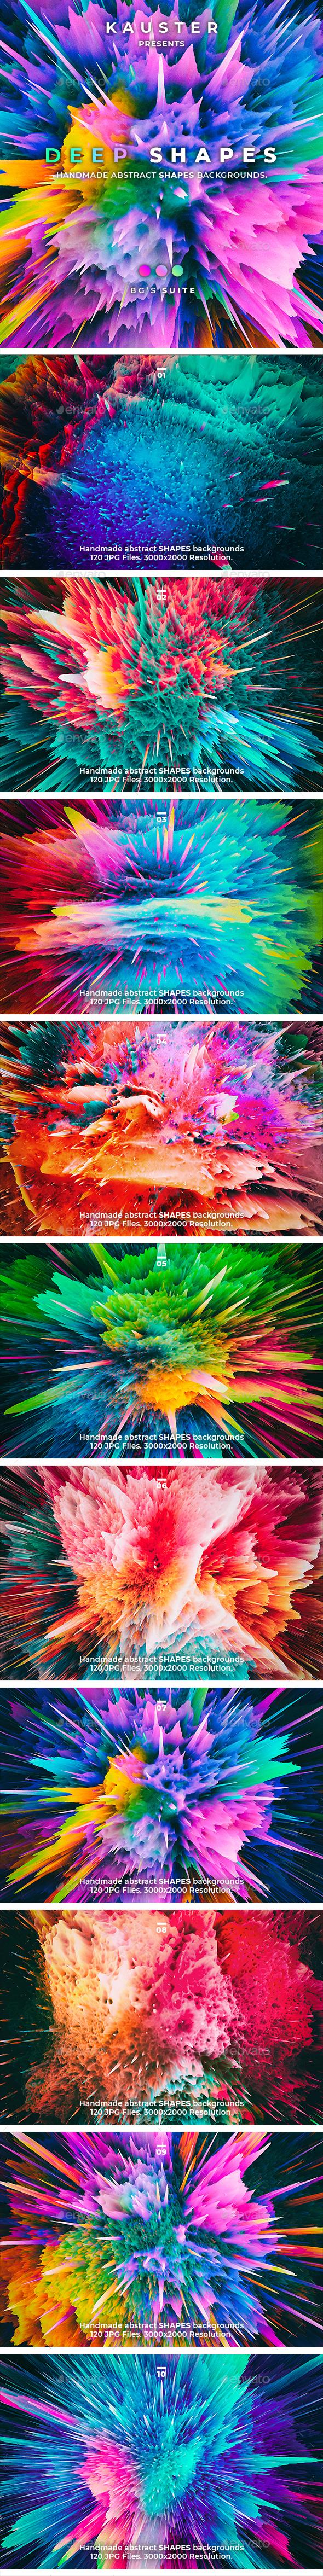 120 Deep Shapes Backgrounds